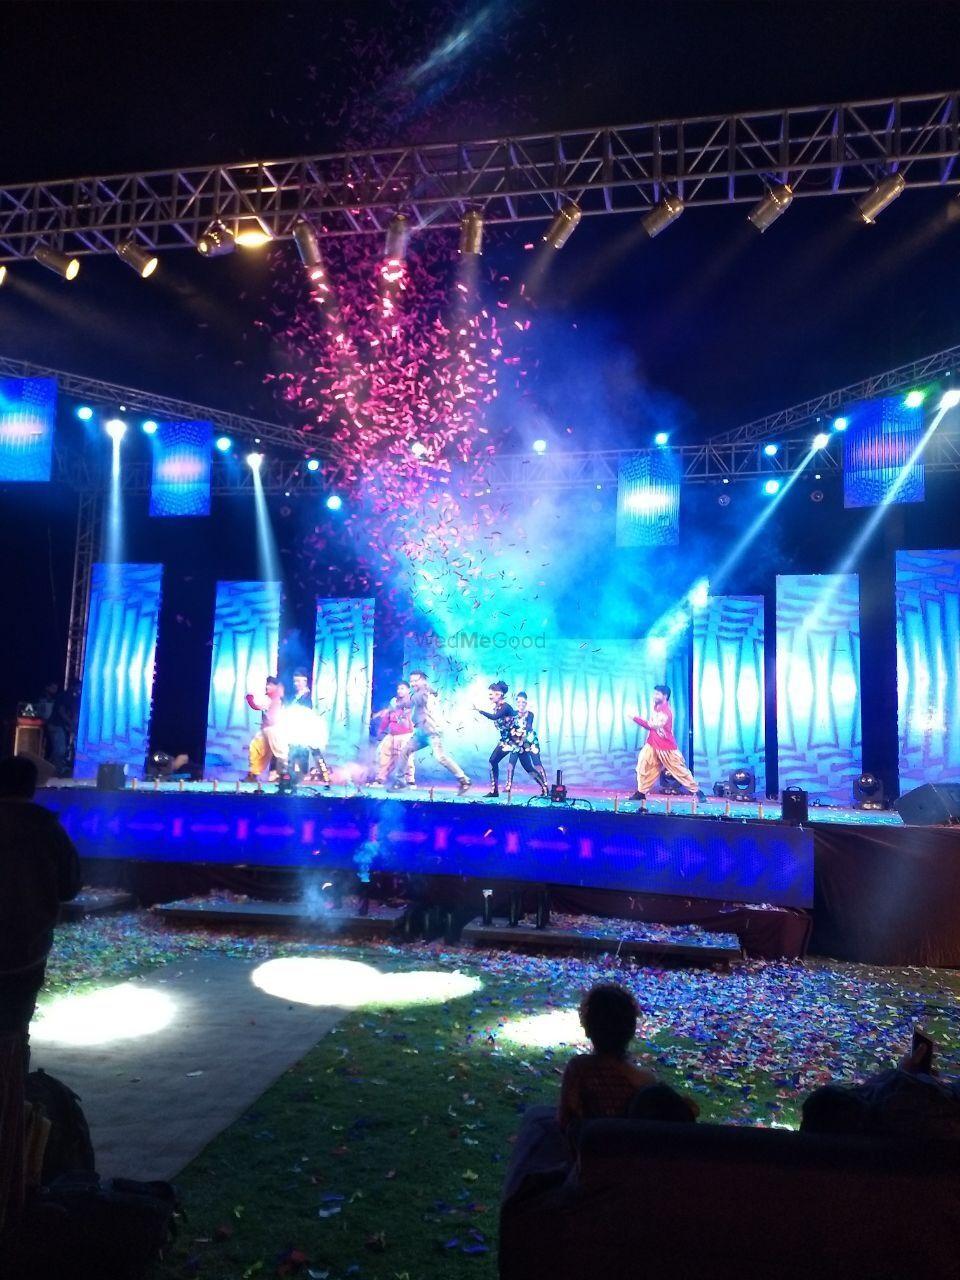 Photo From Raipur Wedding - Babylon inn - By Raahil Dance Team